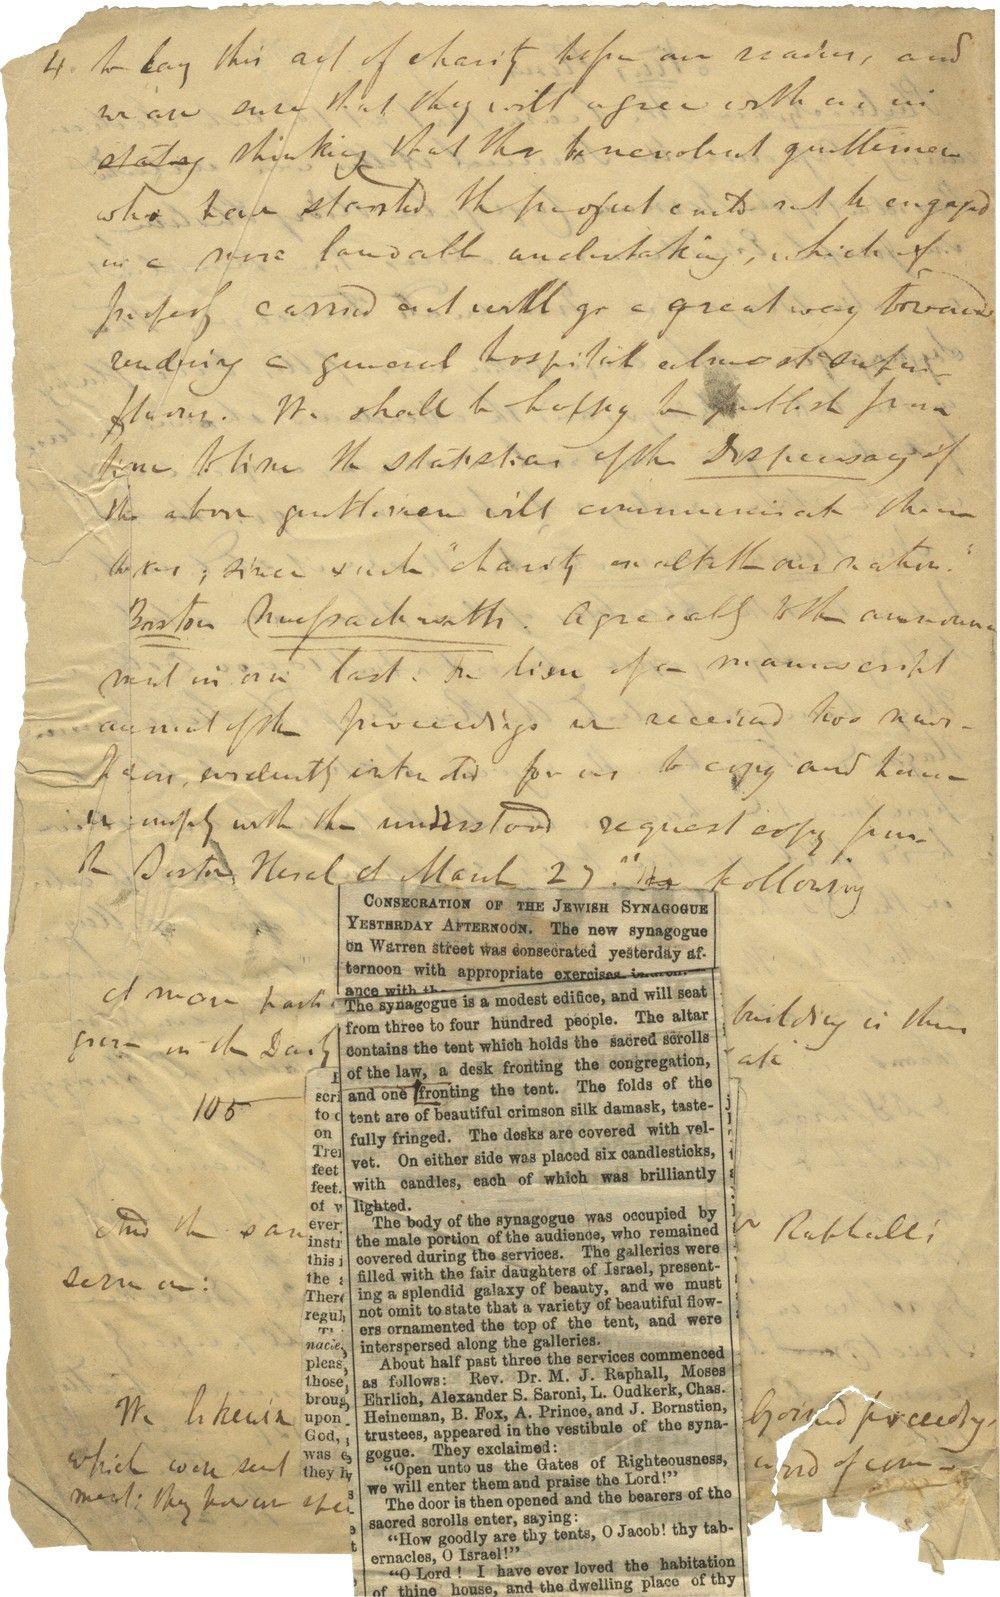 Page 4 transcript